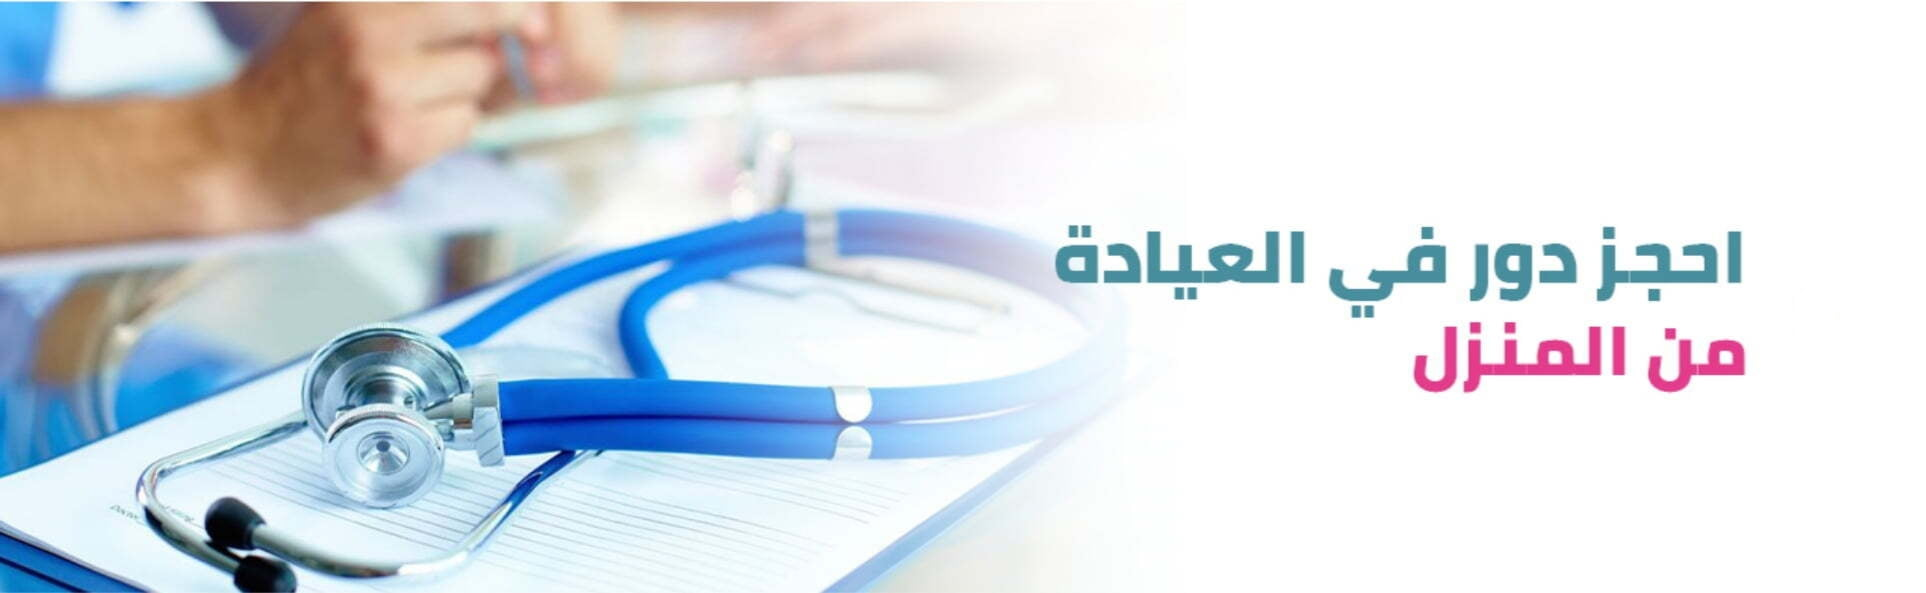 OT clinic